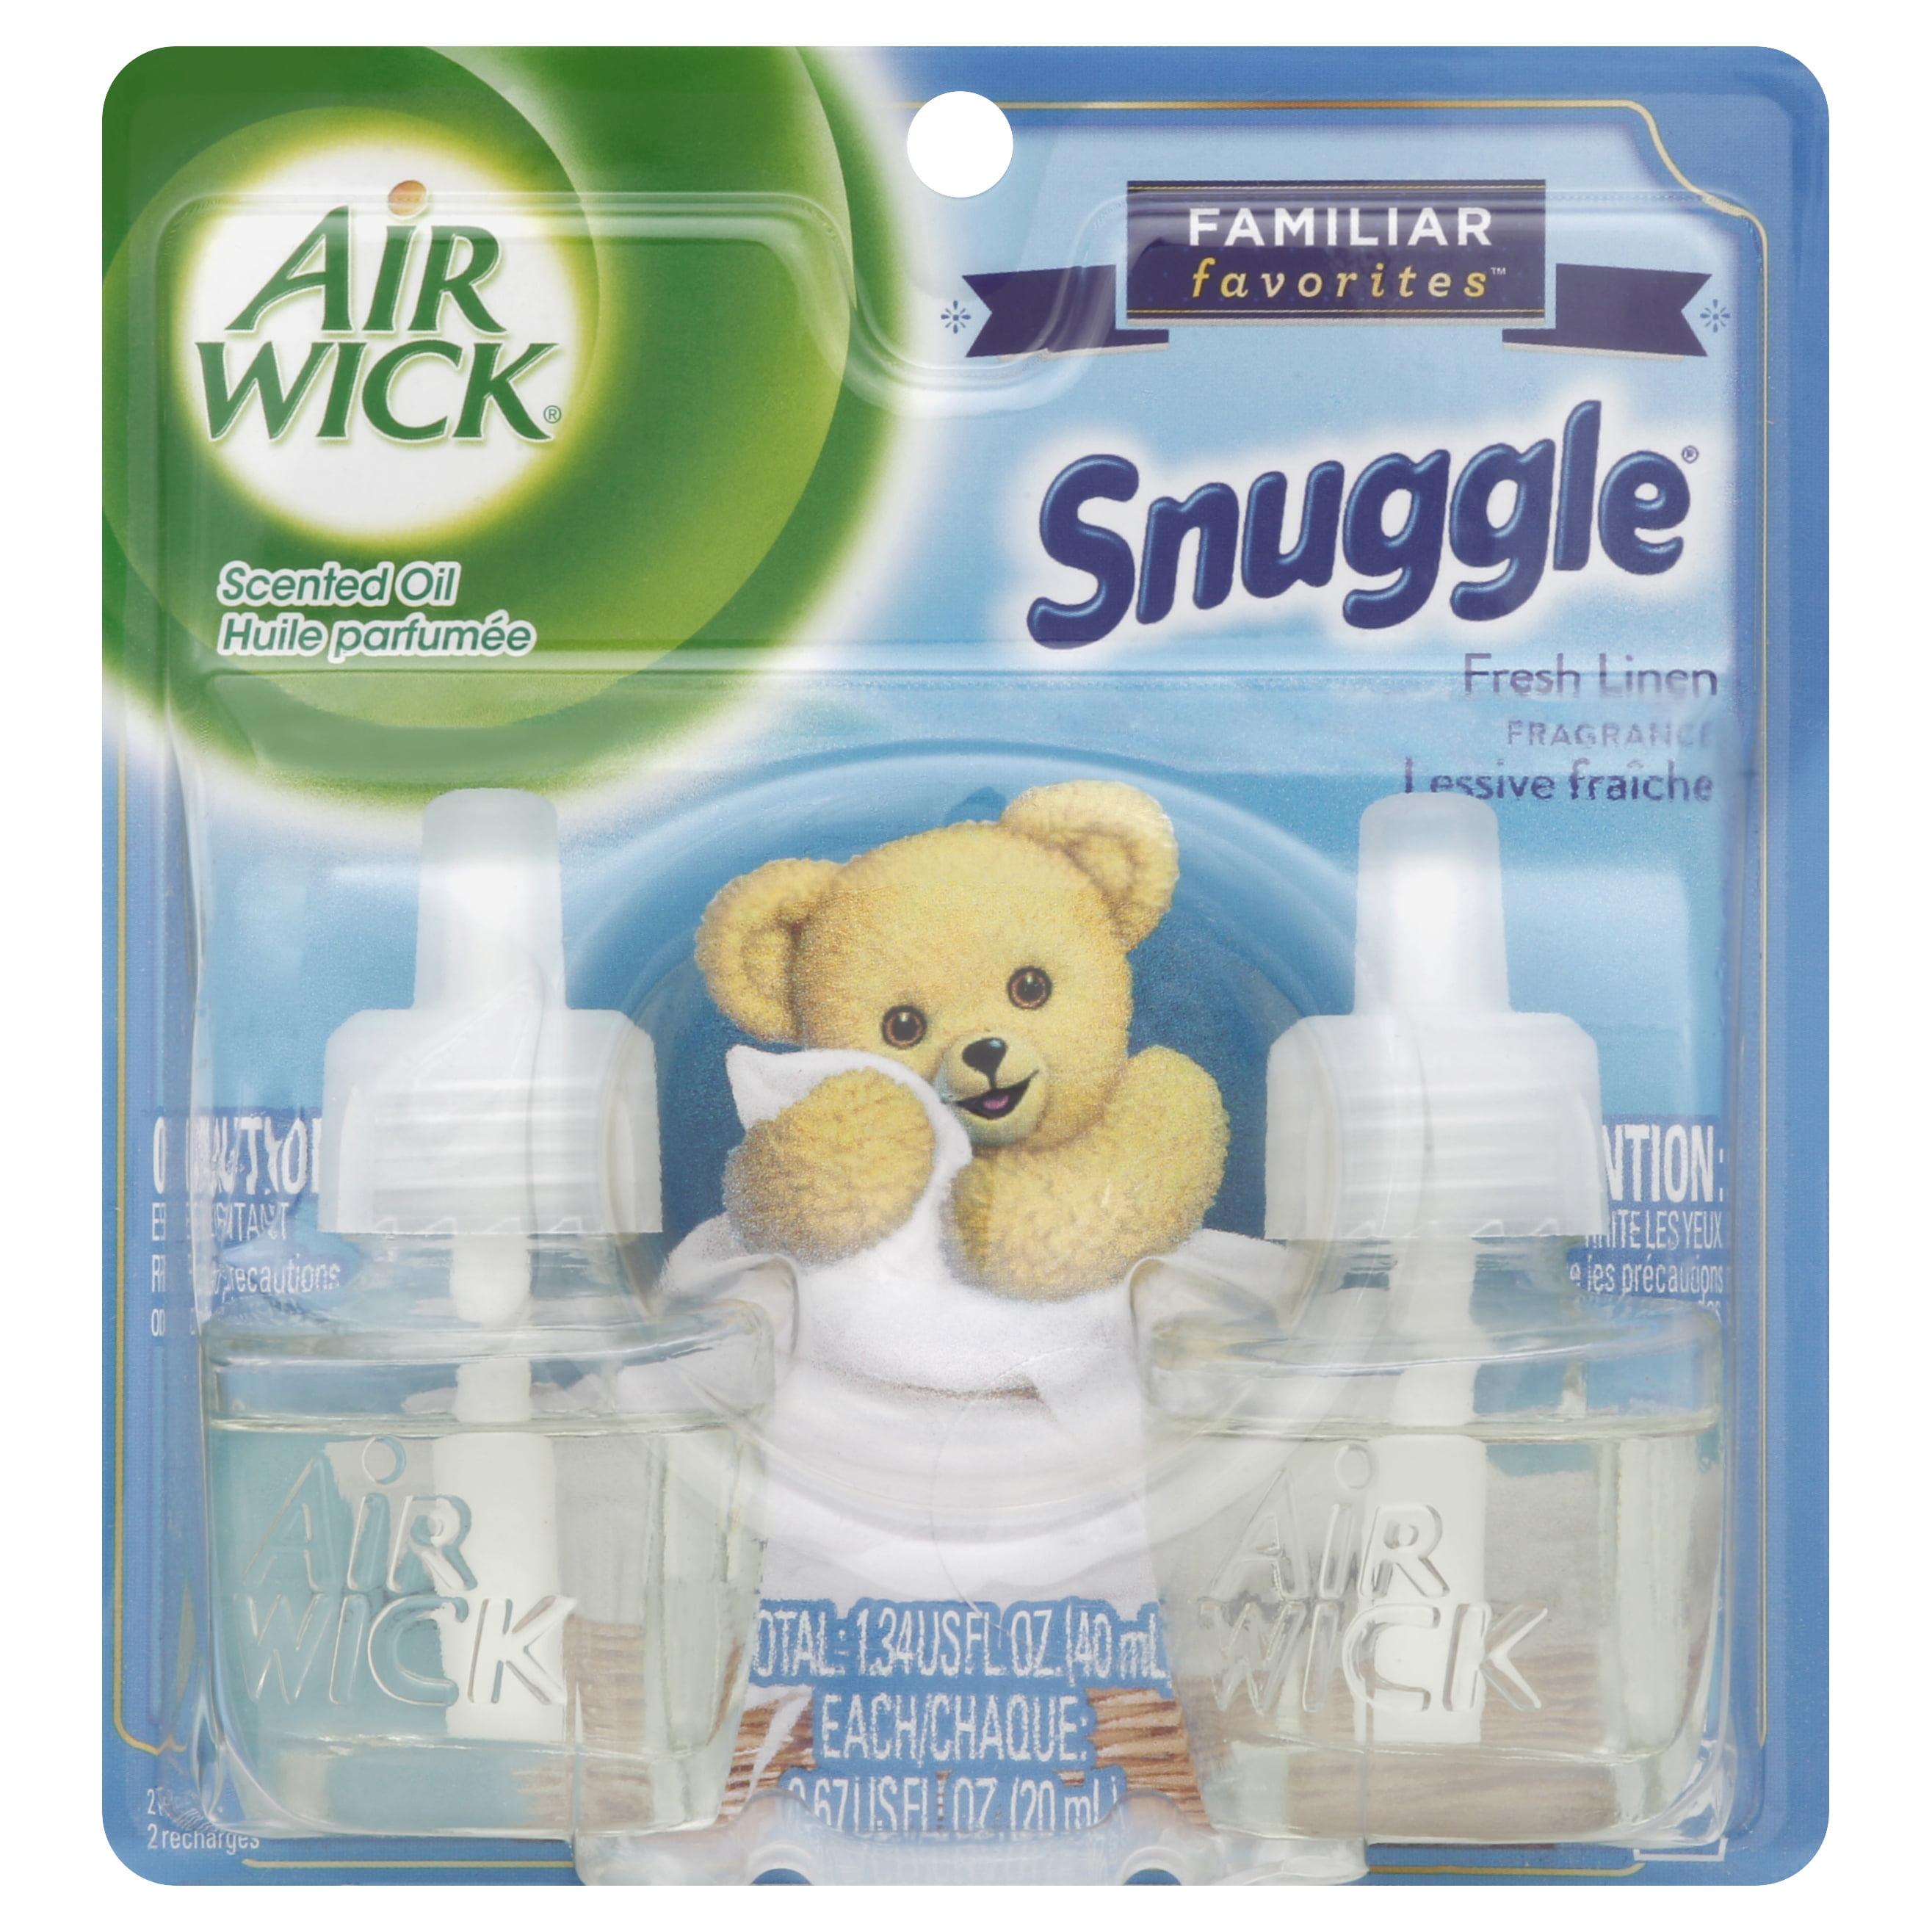 Air Wick Scented Oil Twin Refill Snuggle Fresh Linen (2X.67) Oz.